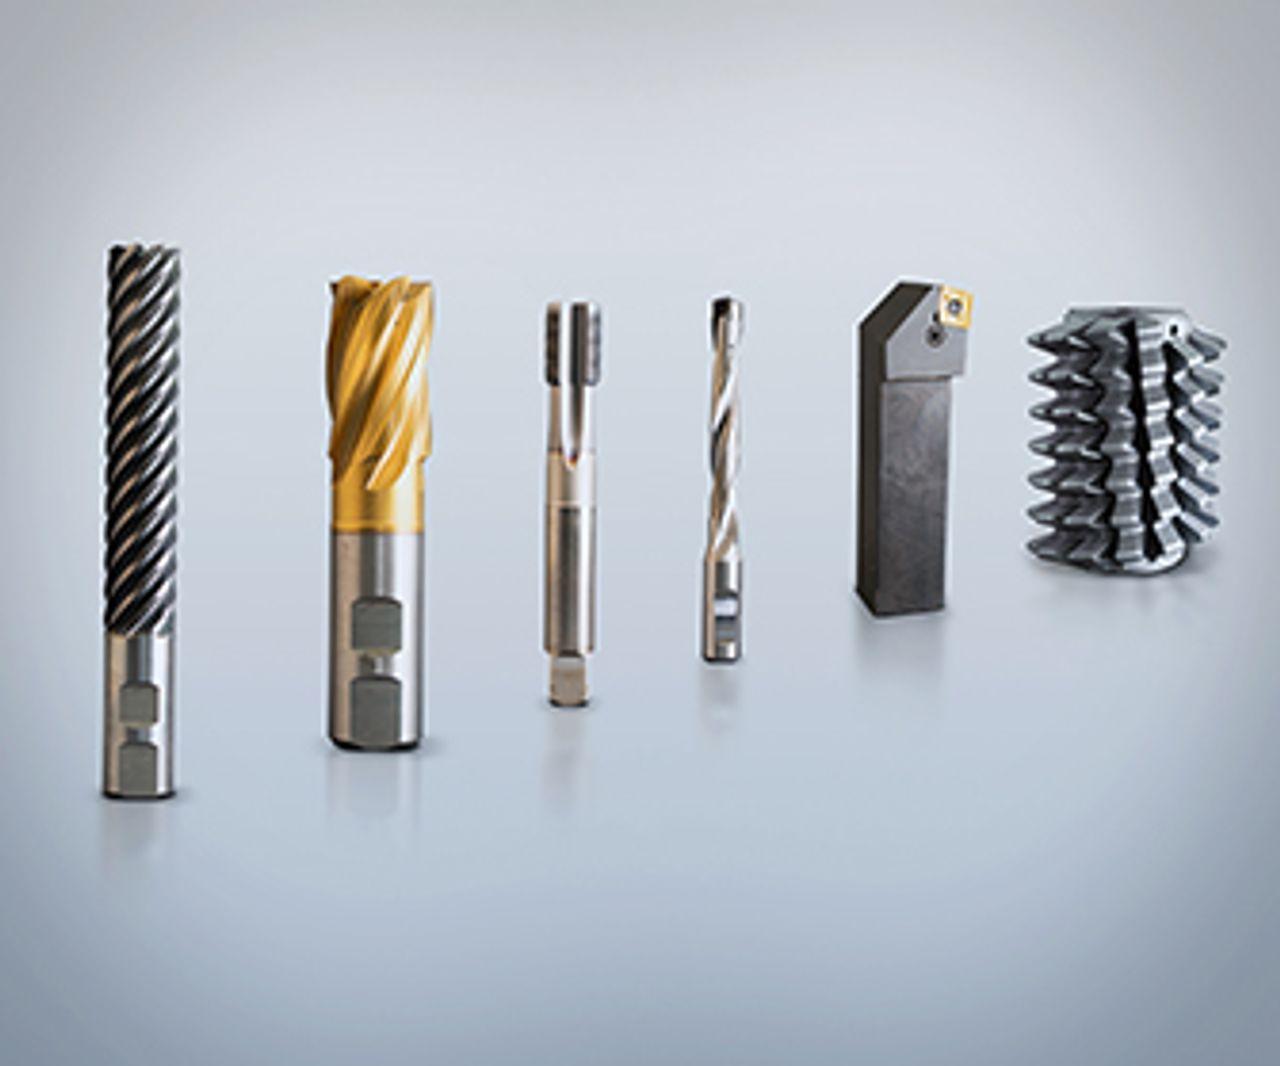 Seis herramientas de corte diferentes sobre un fondo gris